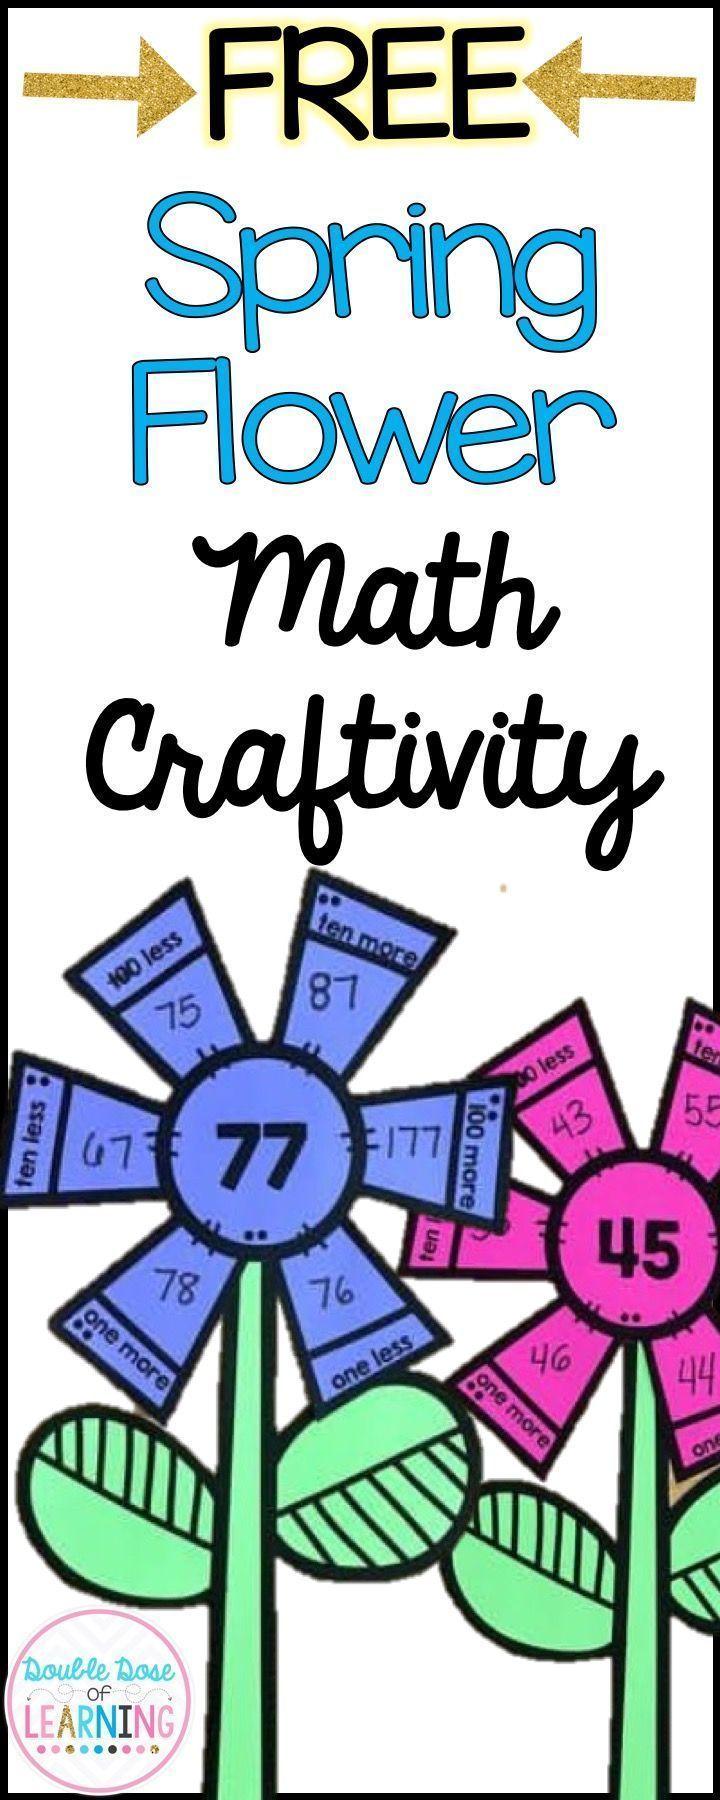 Spring Math Crafts For First Grade Spring Math Math Crafts First Grade Math [ 1800 x 720 Pixel ]